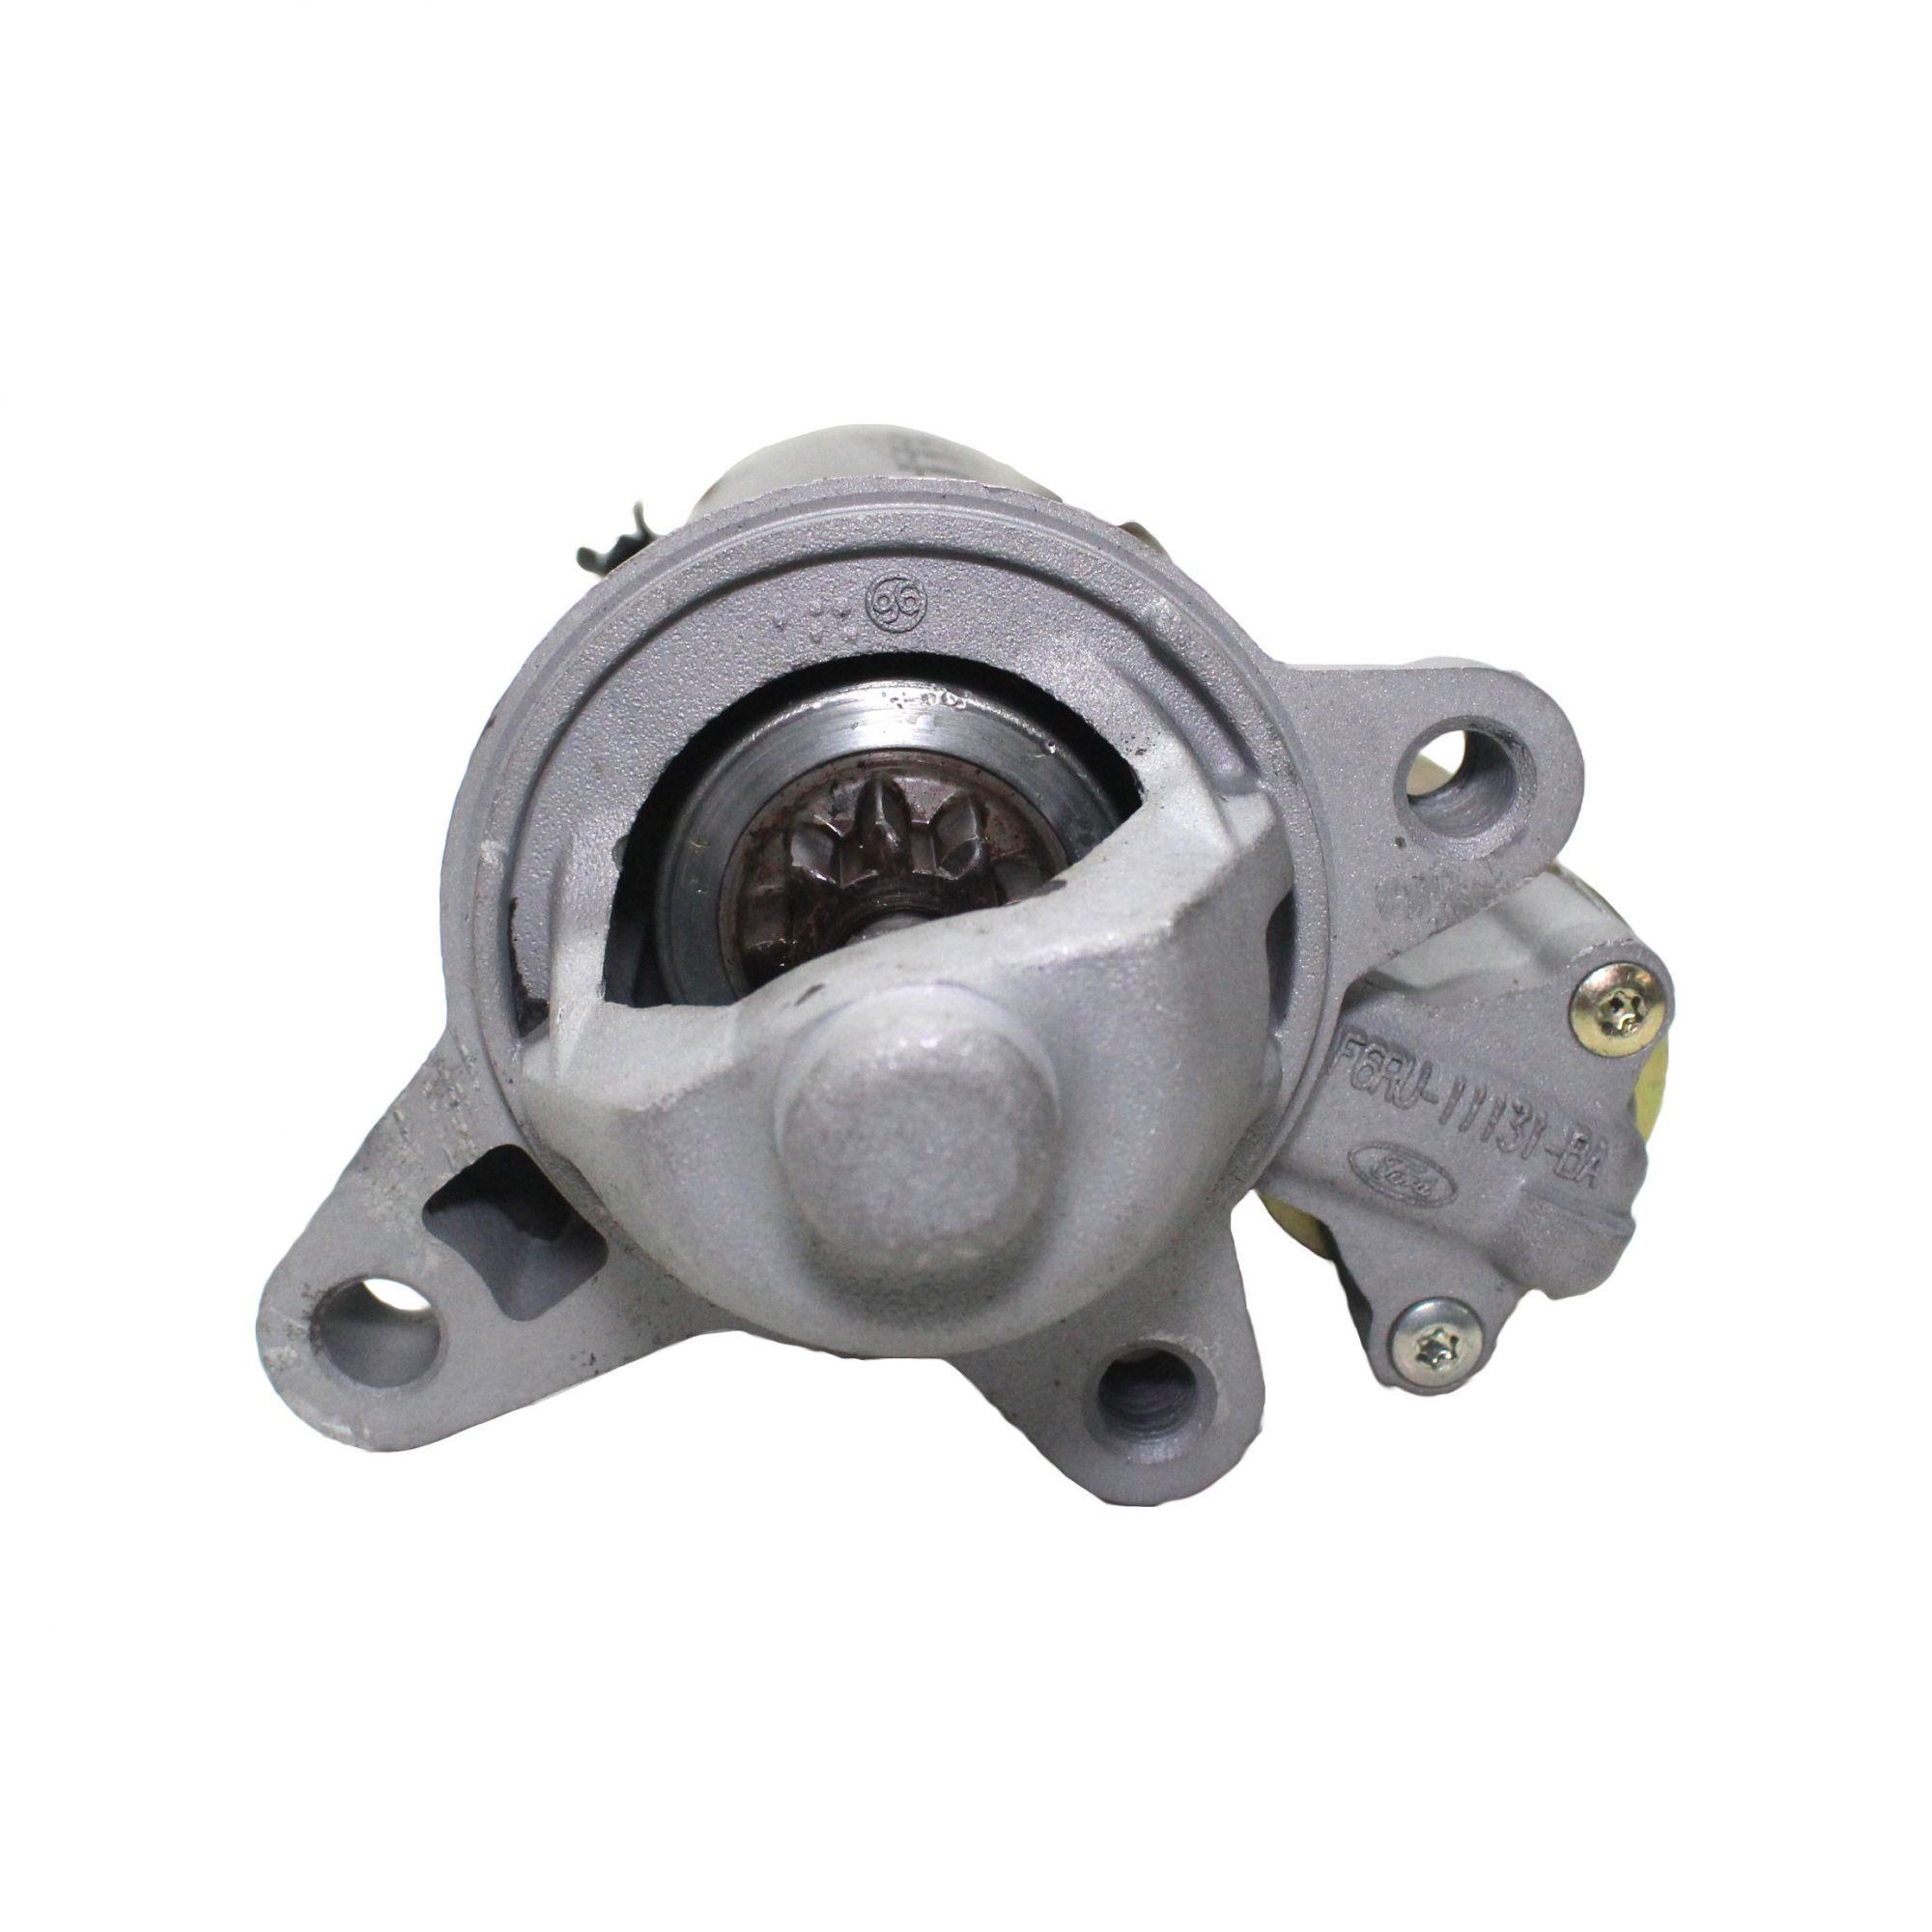 Motor de Arranque Partida Ford Escort, Mondeo mec 1.8/2.0 F6RU11131BA - Recon